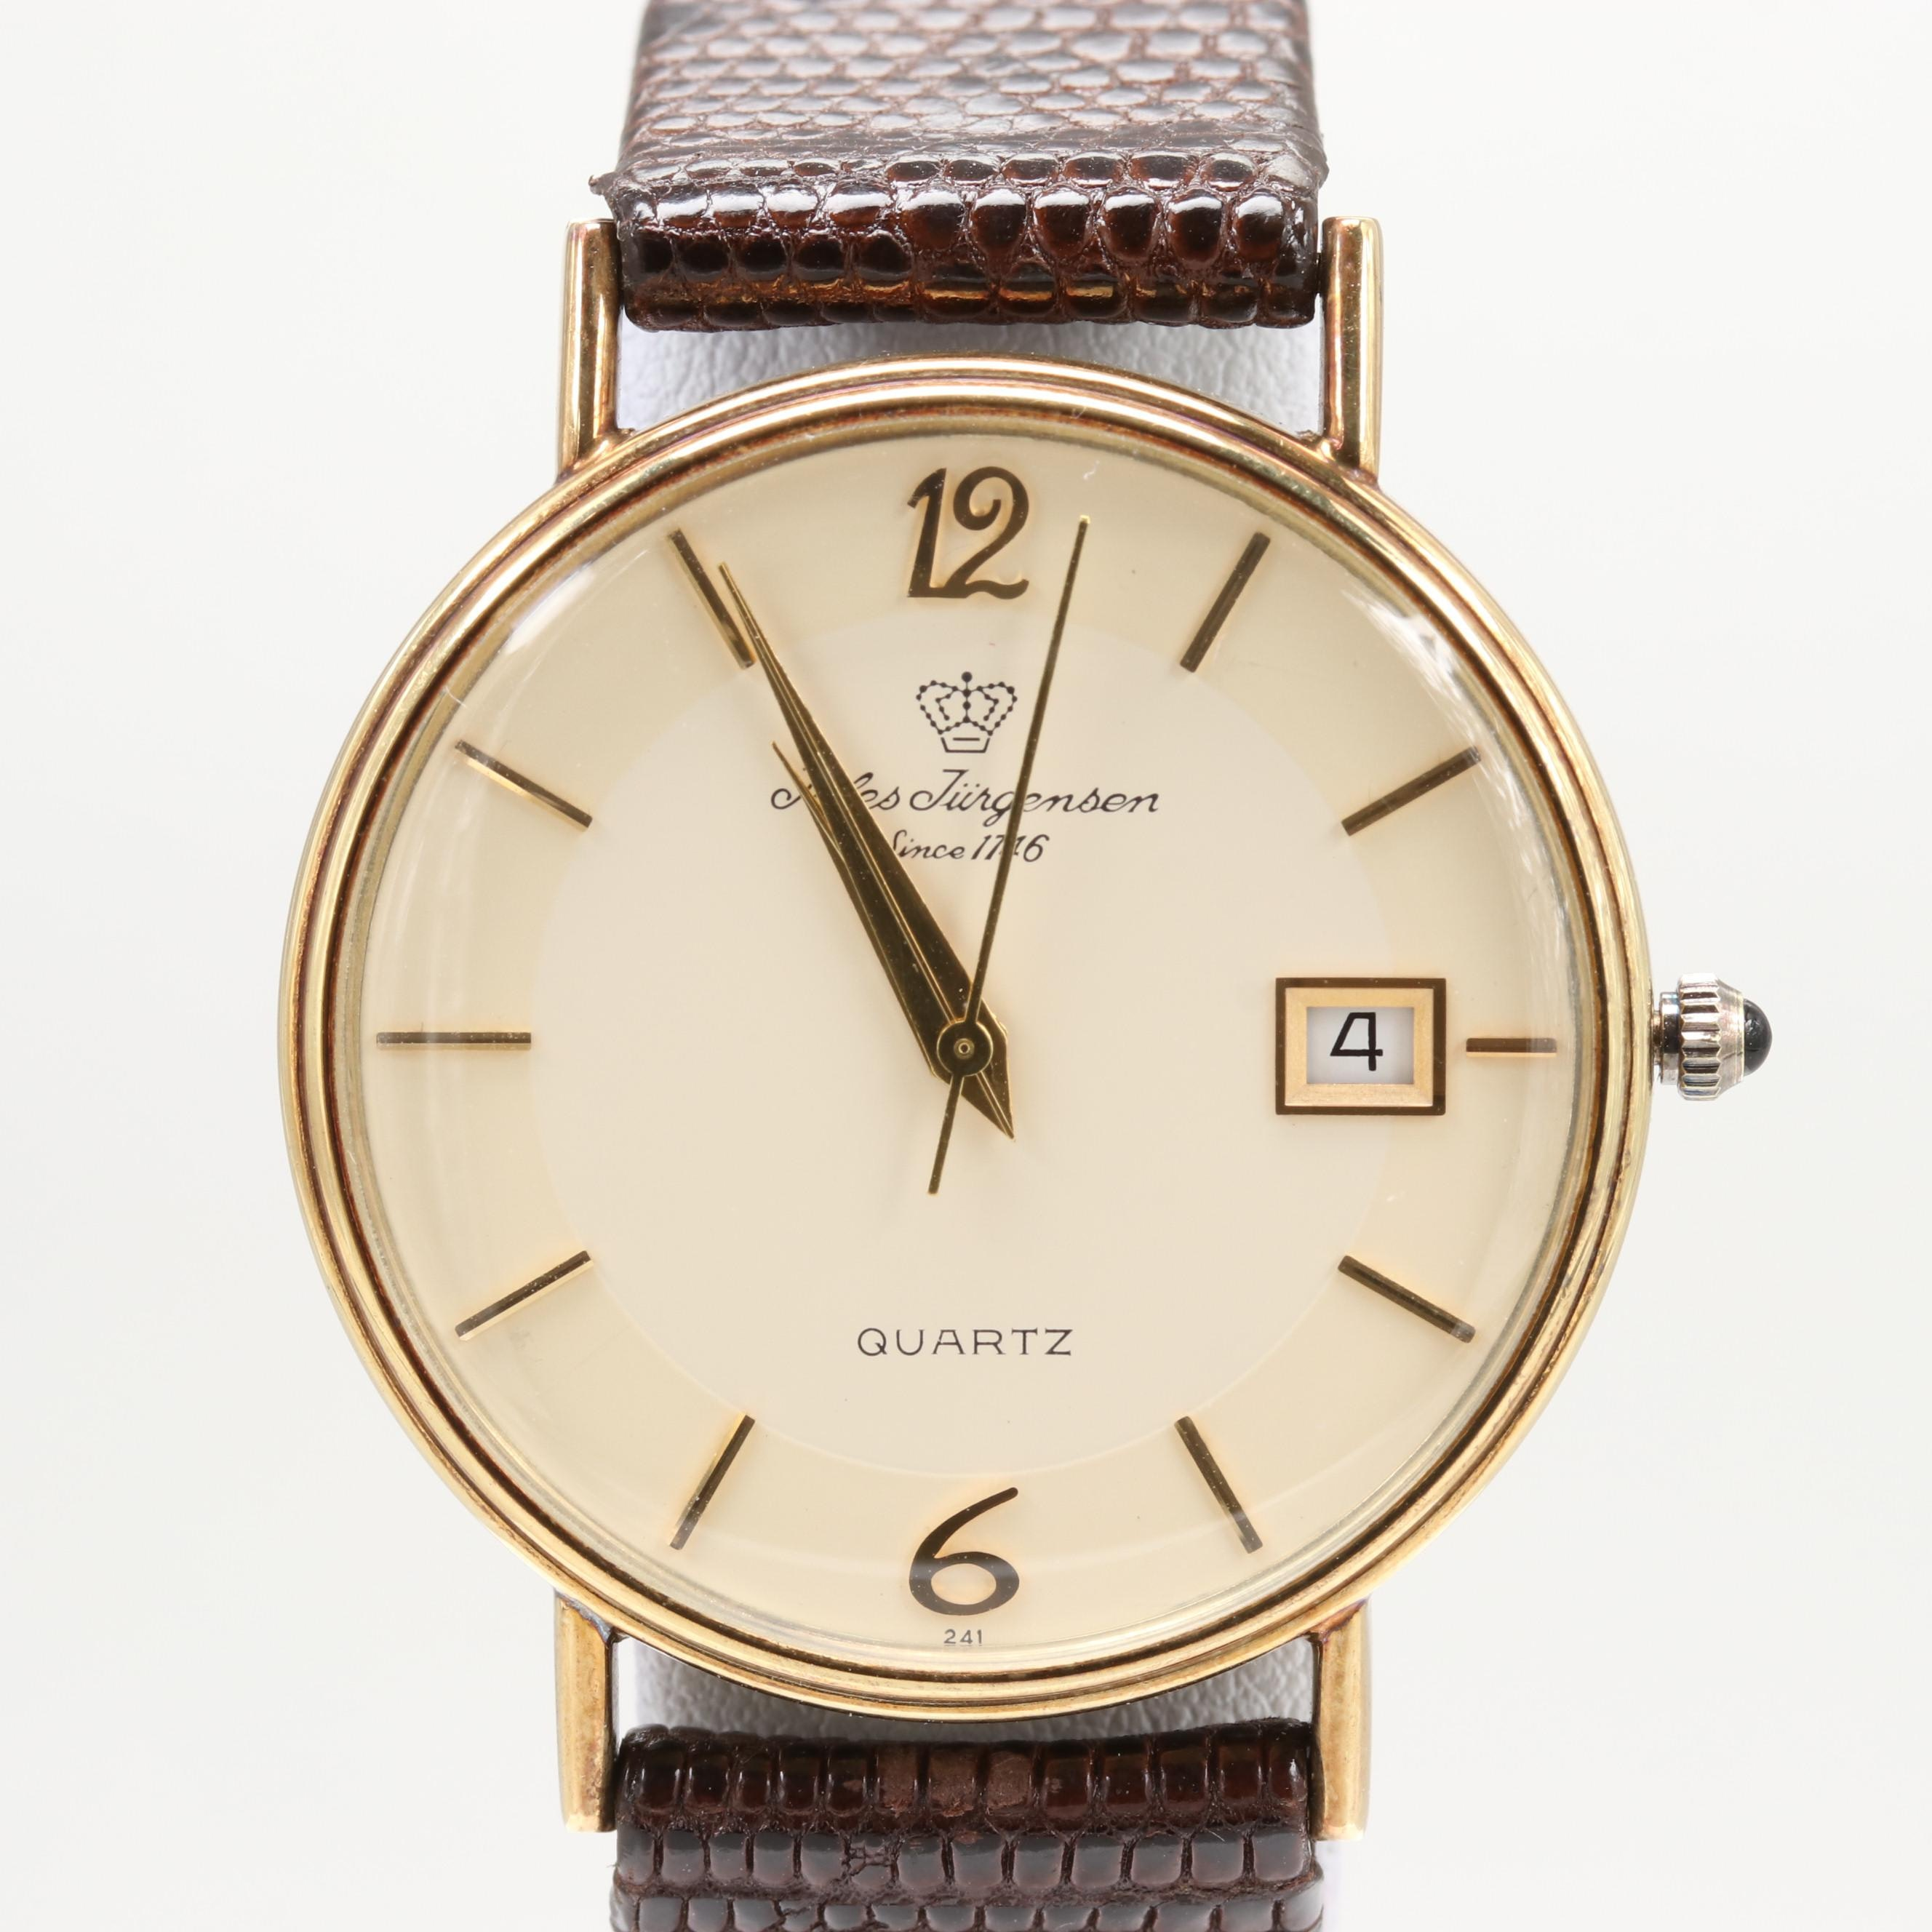 Jules Jurgensen 14K Yellow Gold Quartz Wristwatch With Date Window